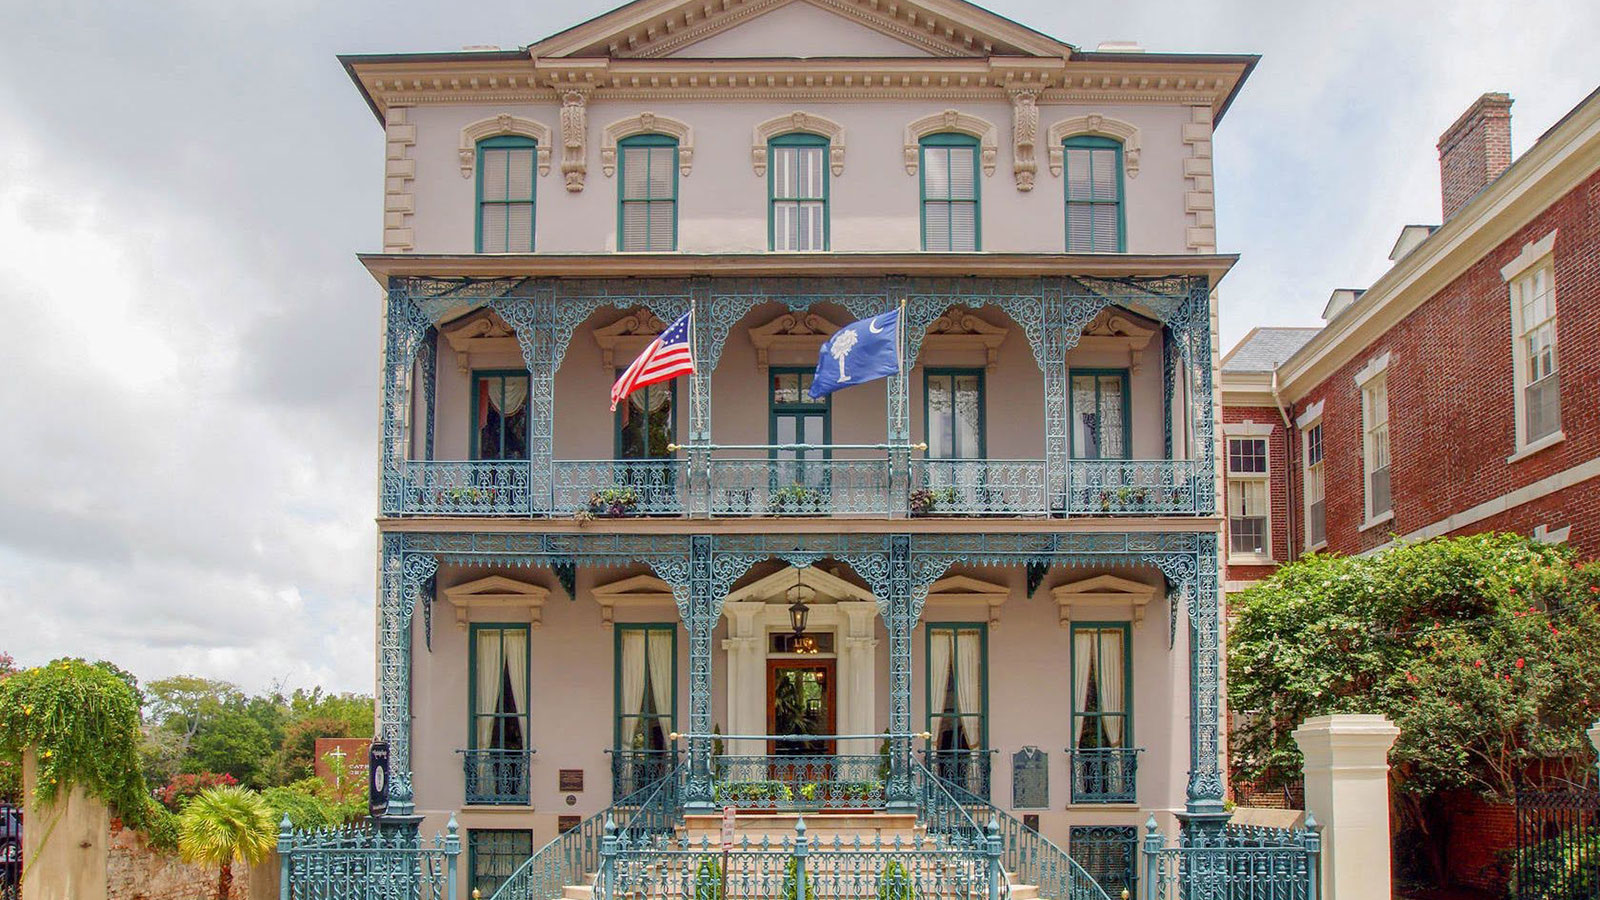 Image of Exterior, John Rutledge House Inn in Charleston, South Carolina, 1763, Member of Historic Hotels of America, Overview